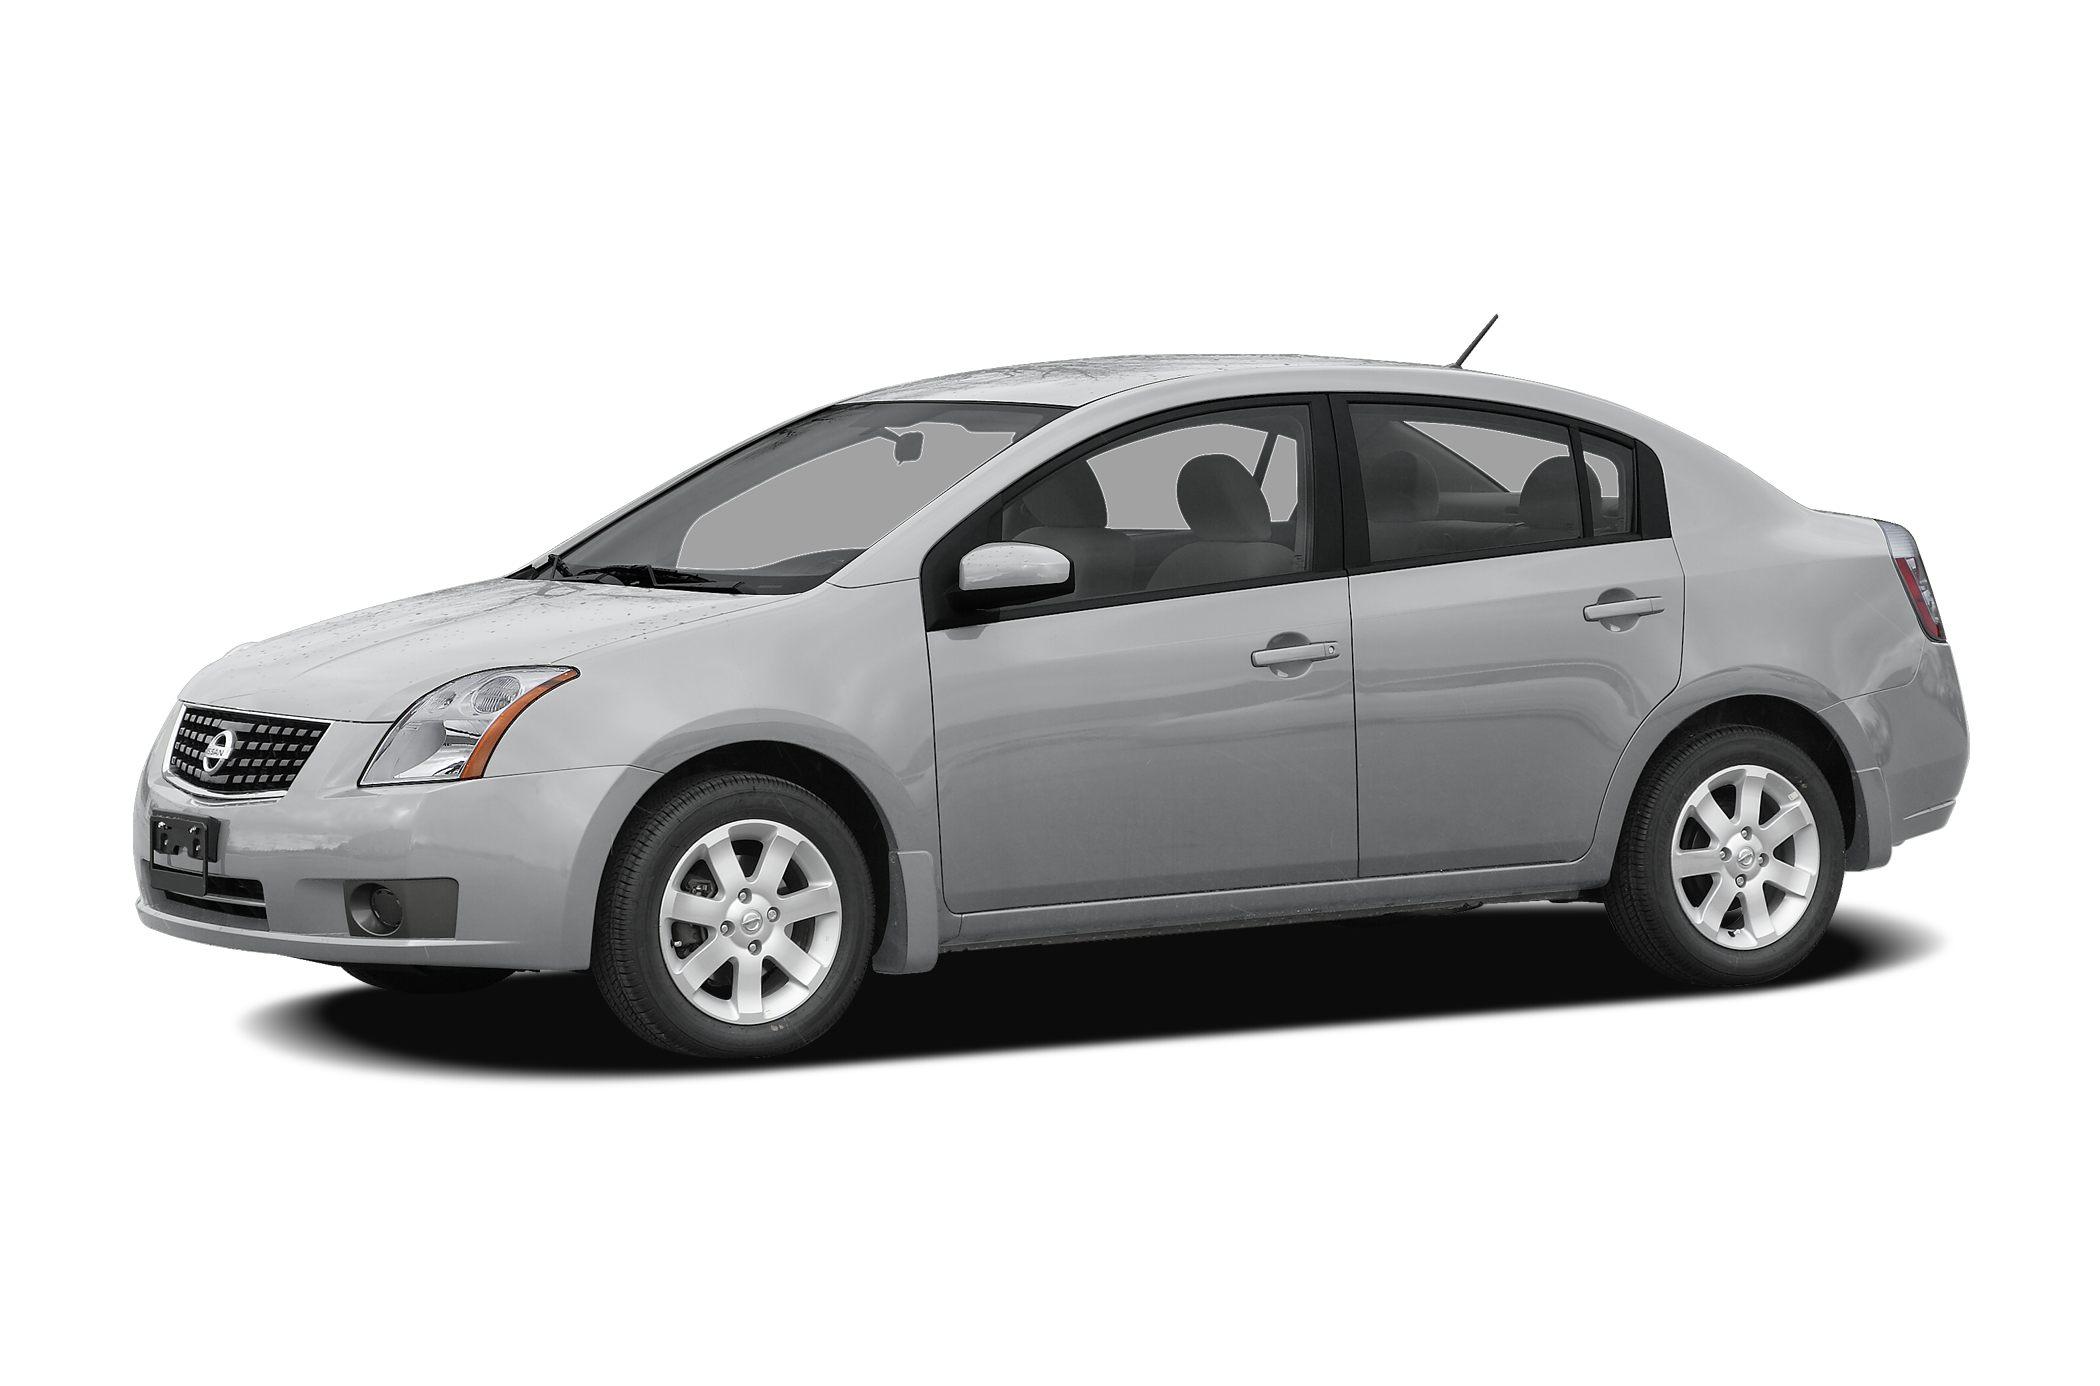 2007 Nissan Sentra  Miles 73654Color Gray Stock 16781 VIN 3N1AB61E67L706577